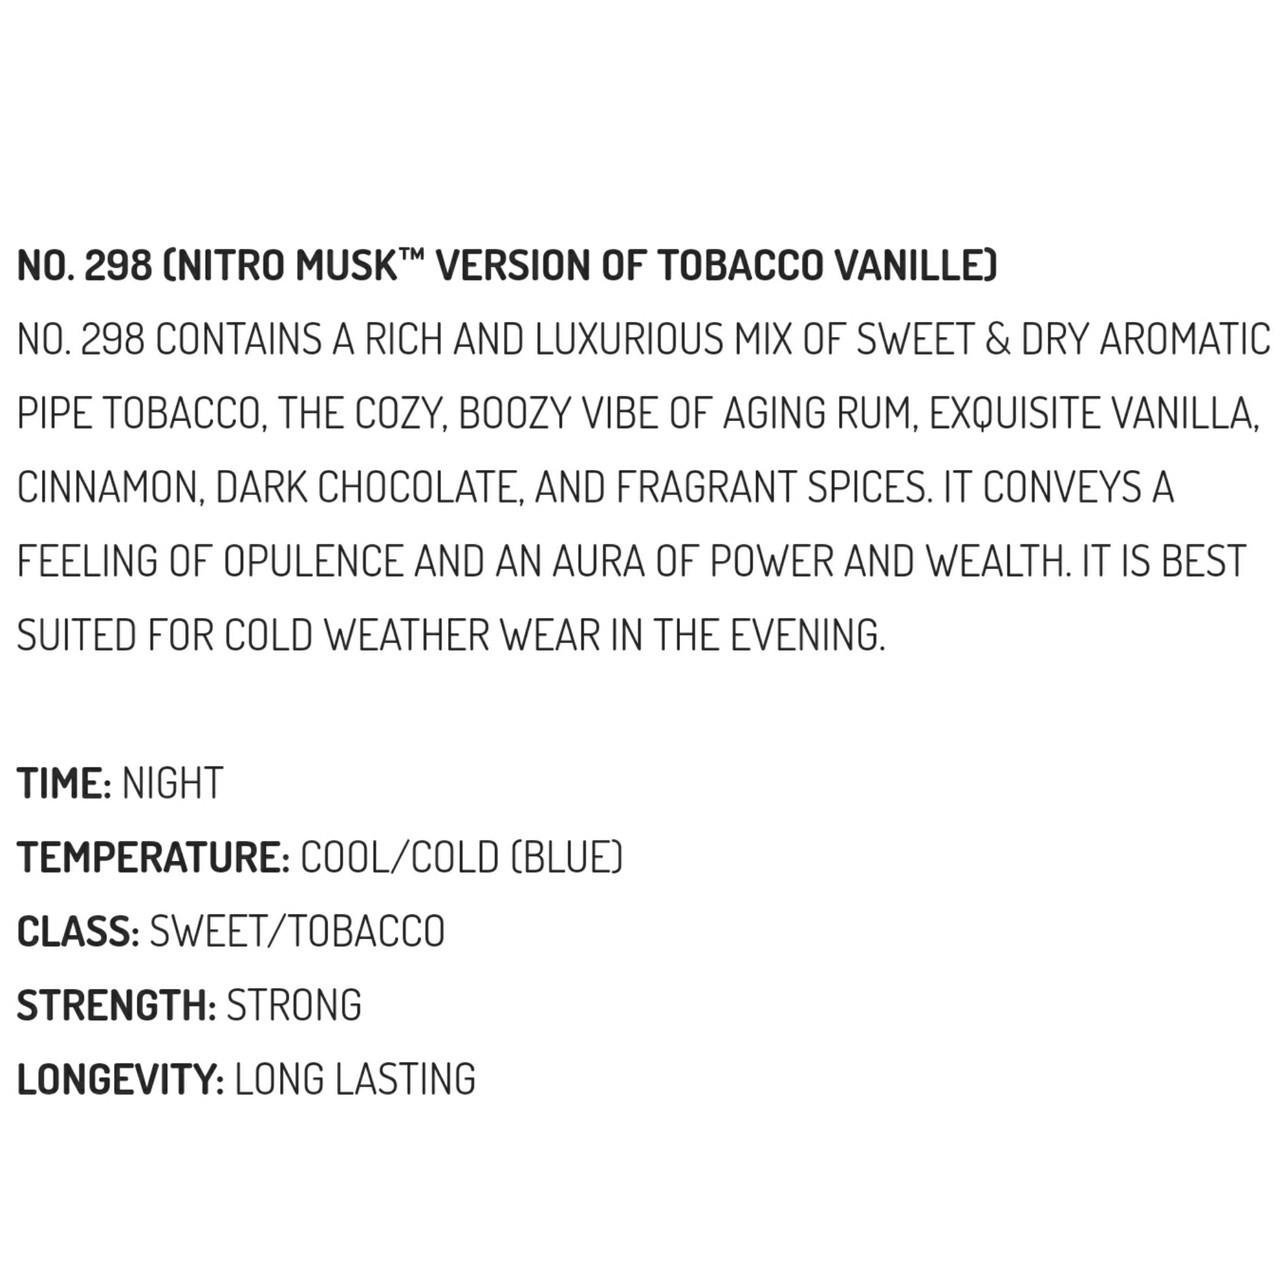 Musk & Hustle No. 298 Nitro Stubbie (Version of Tobacco Vanille)